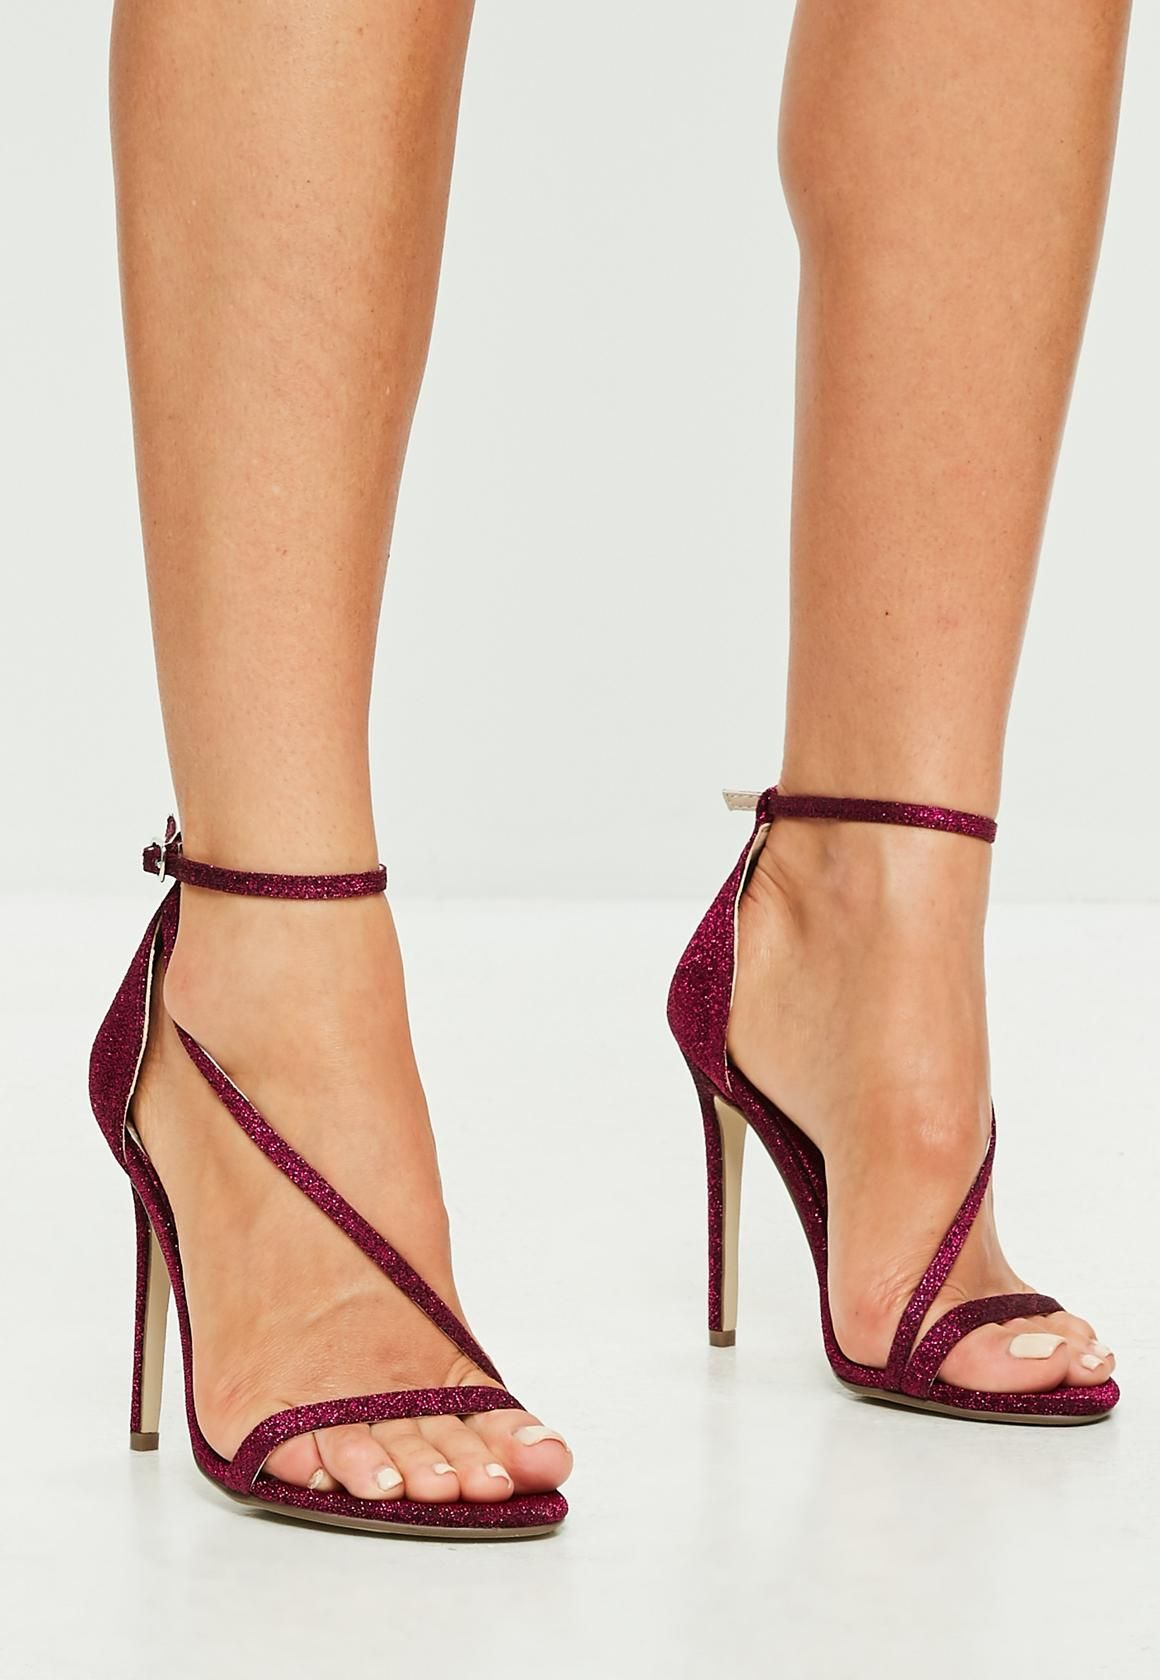 882543fdf119b0 Missguided - burgundy glitter asymmetric barely there sandal heels ...